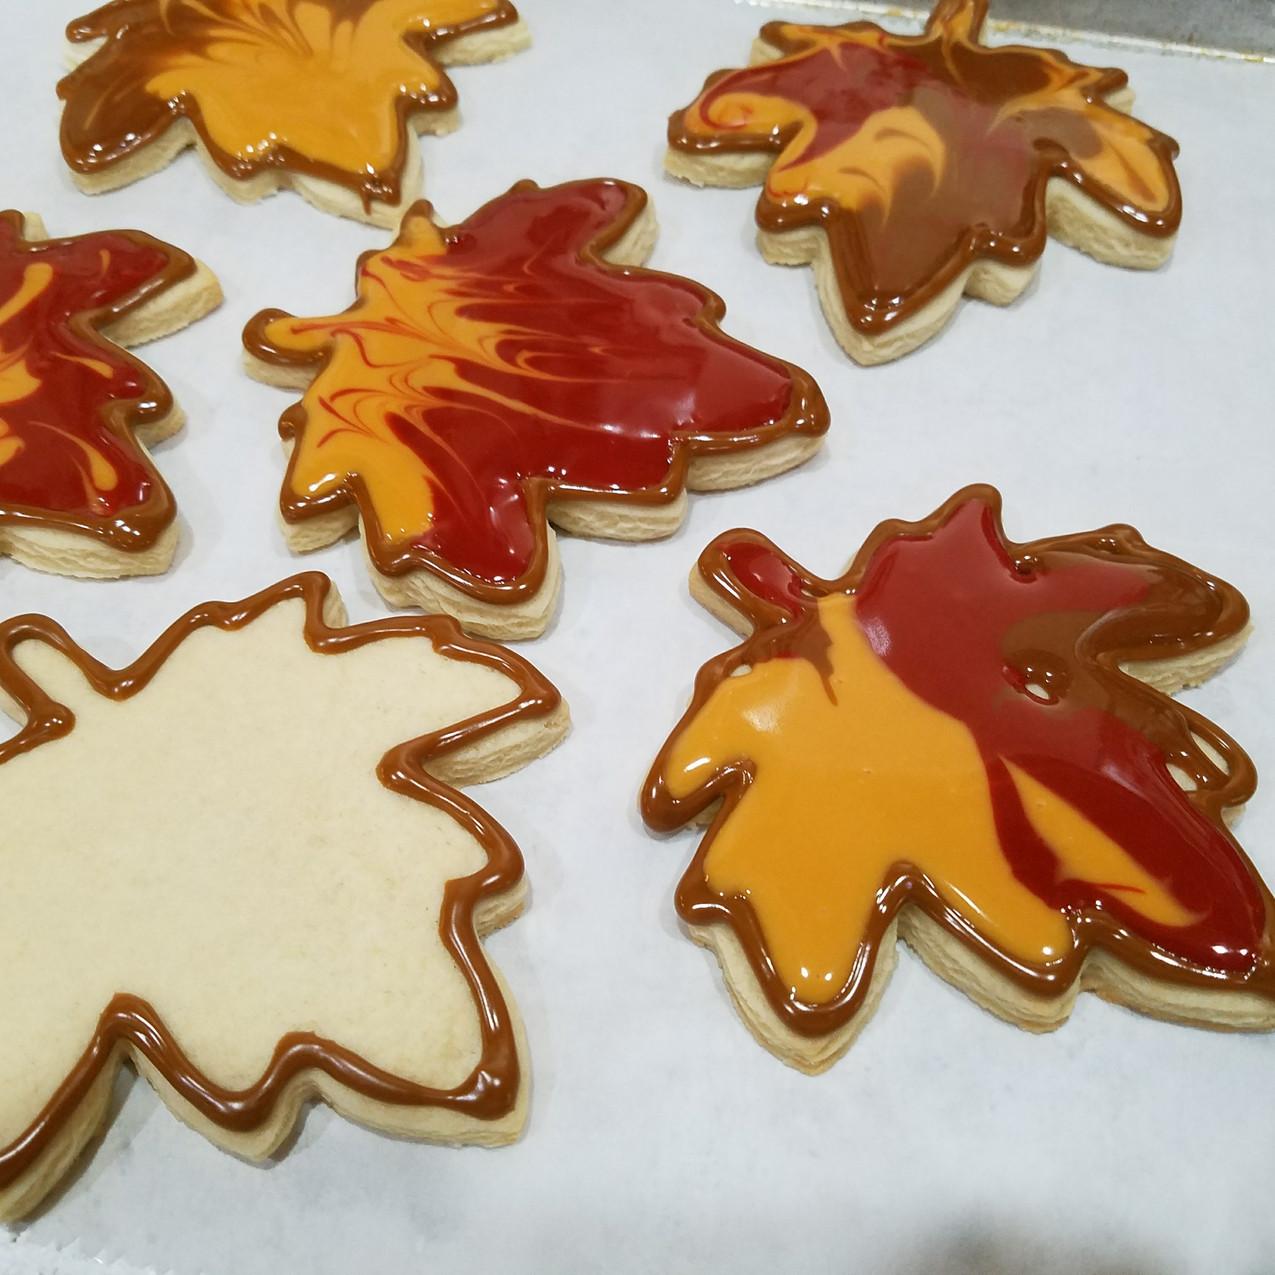 Flood the Cookies